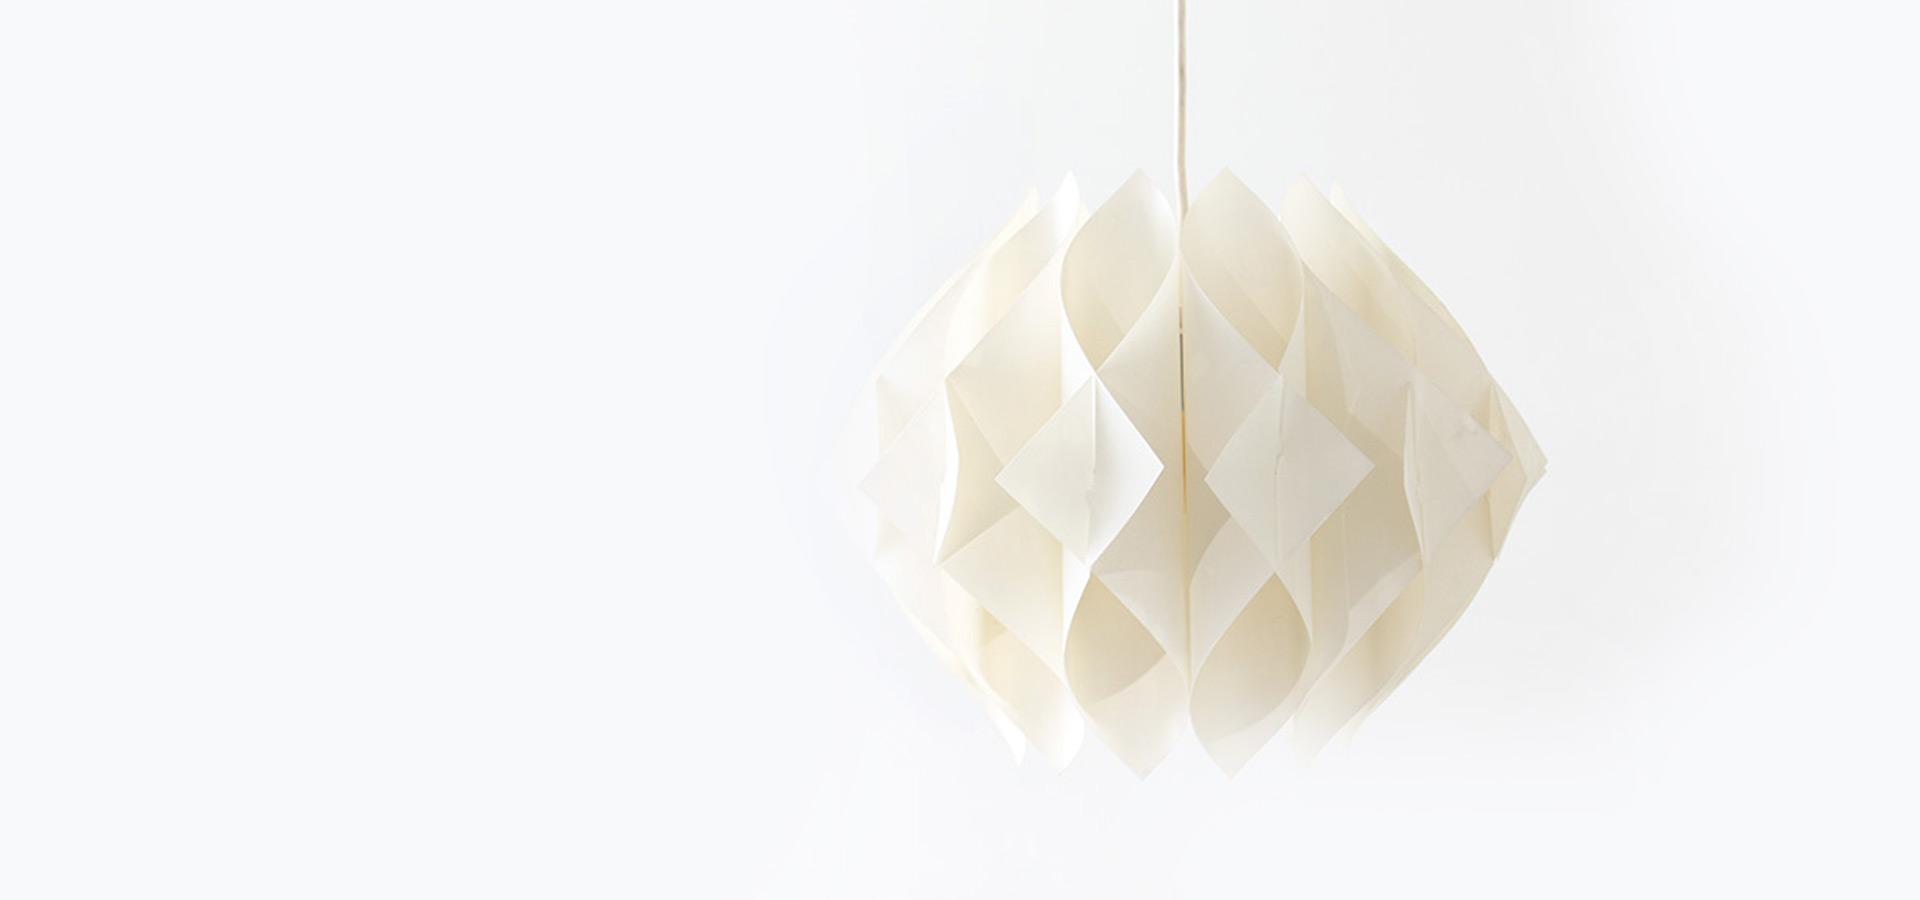 Vintage verlichting Lars Schioler Butterfly lamp Hoyrup